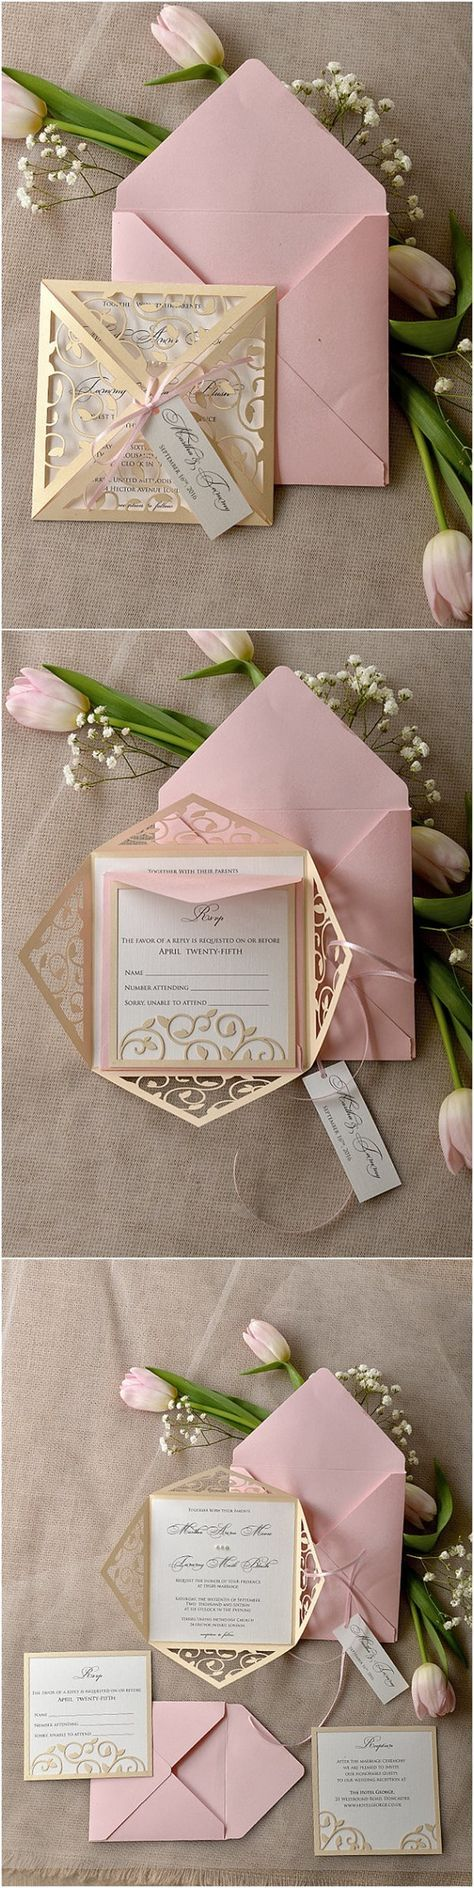 Vintage Patel Pink Blush Gold Laser Cut Quincenaera Invitation Idea | Quinceanera Invitation | Quinceanera Ideas DIY | Quinceanera Idea |